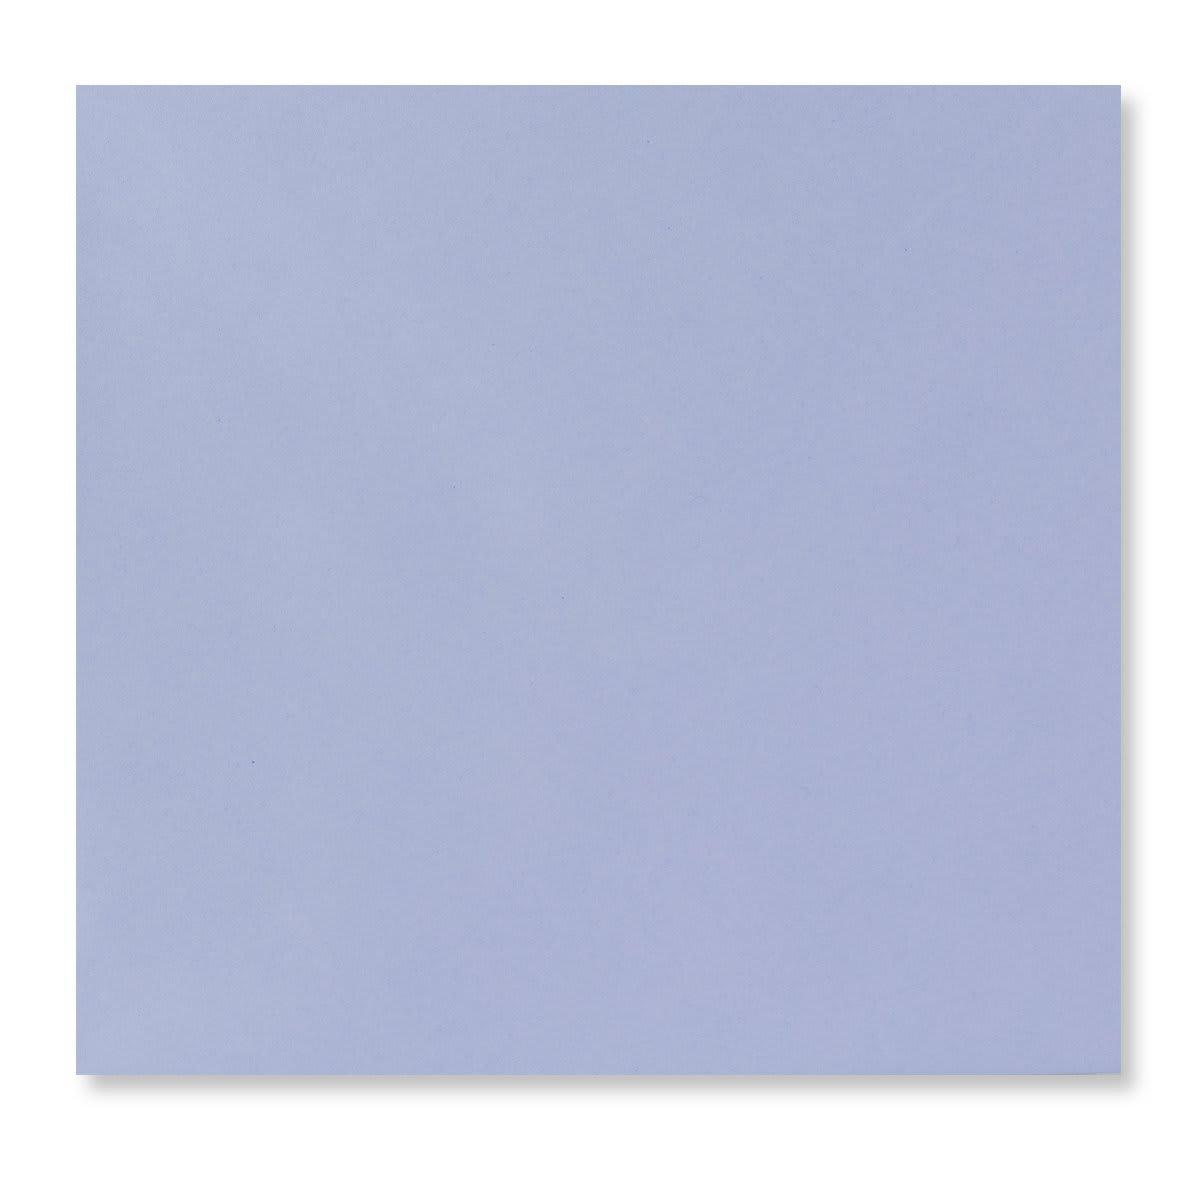 WEDGWOOD BLUE 155mm SQUARE ENVELOPES